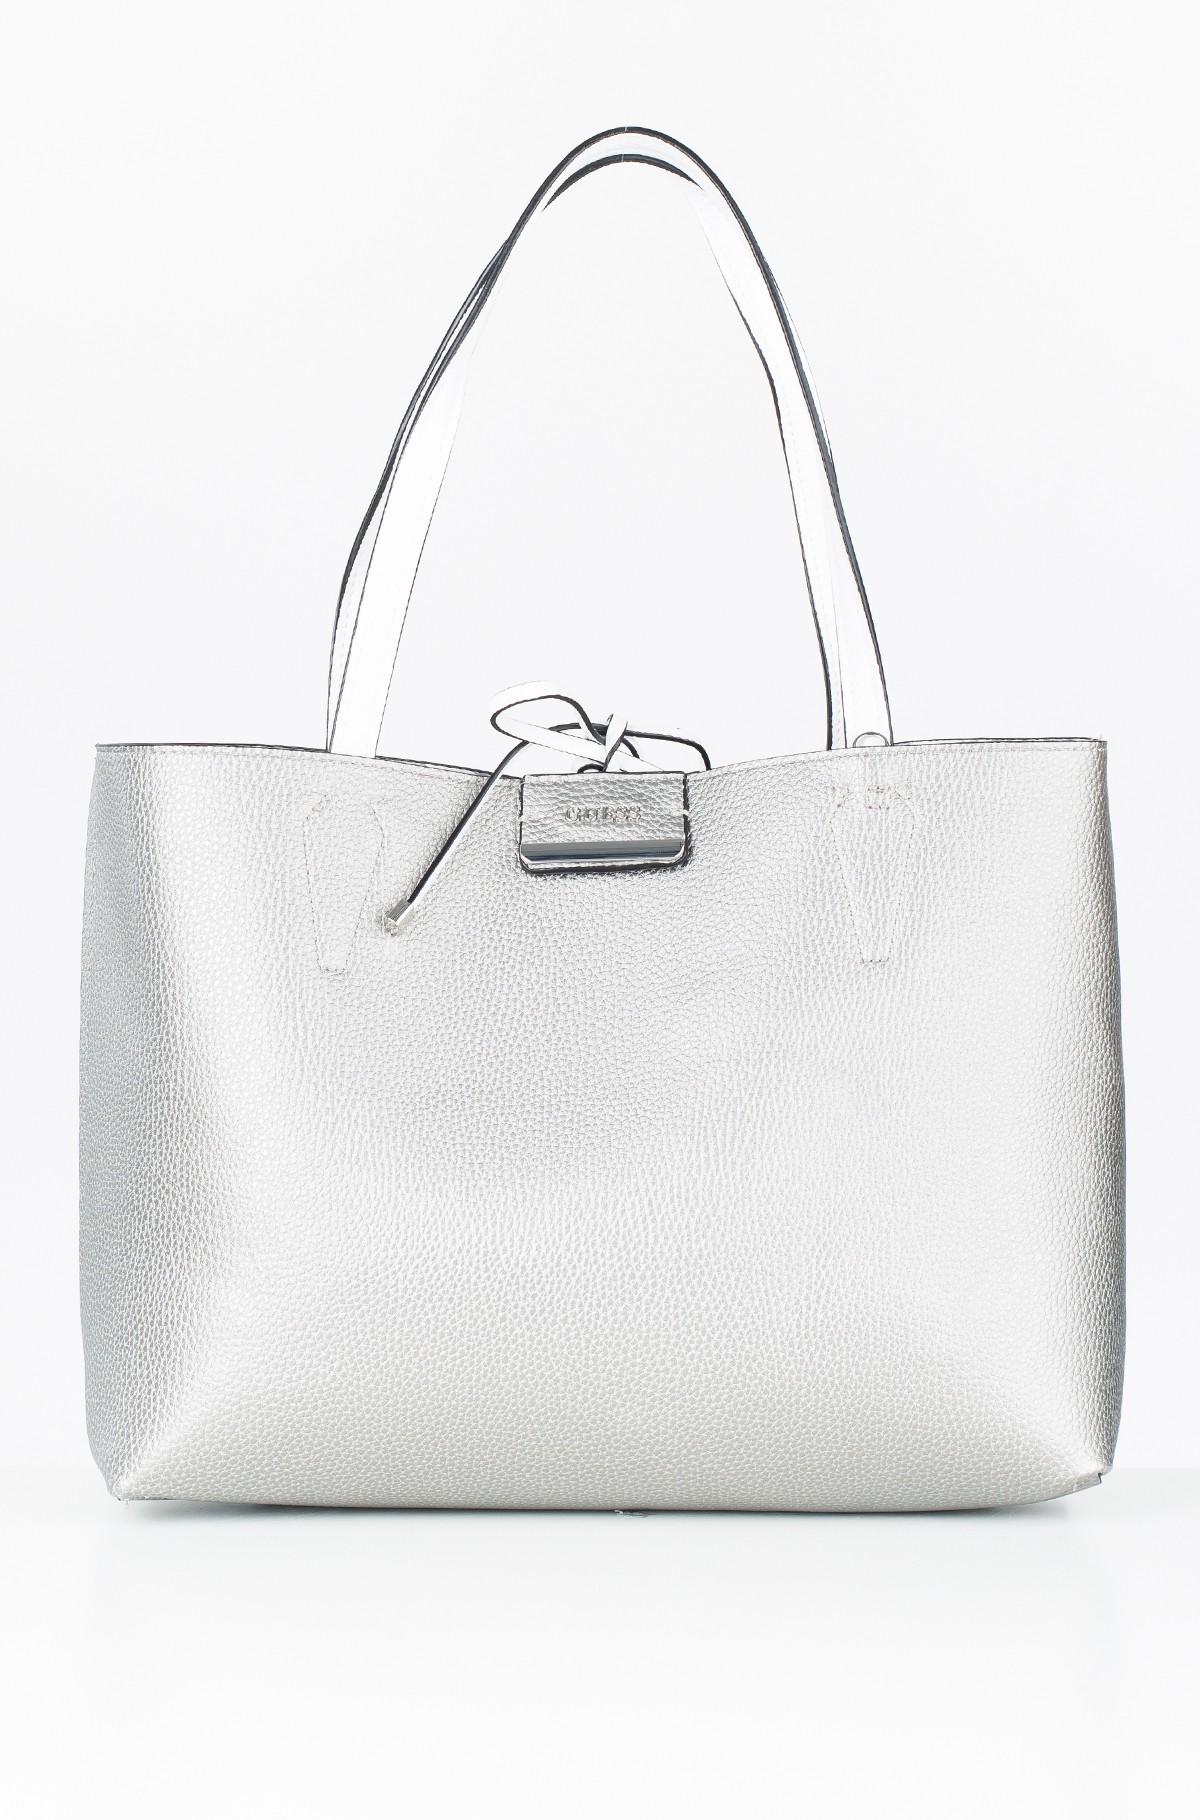 Handbag HWAC64 22150-full-1